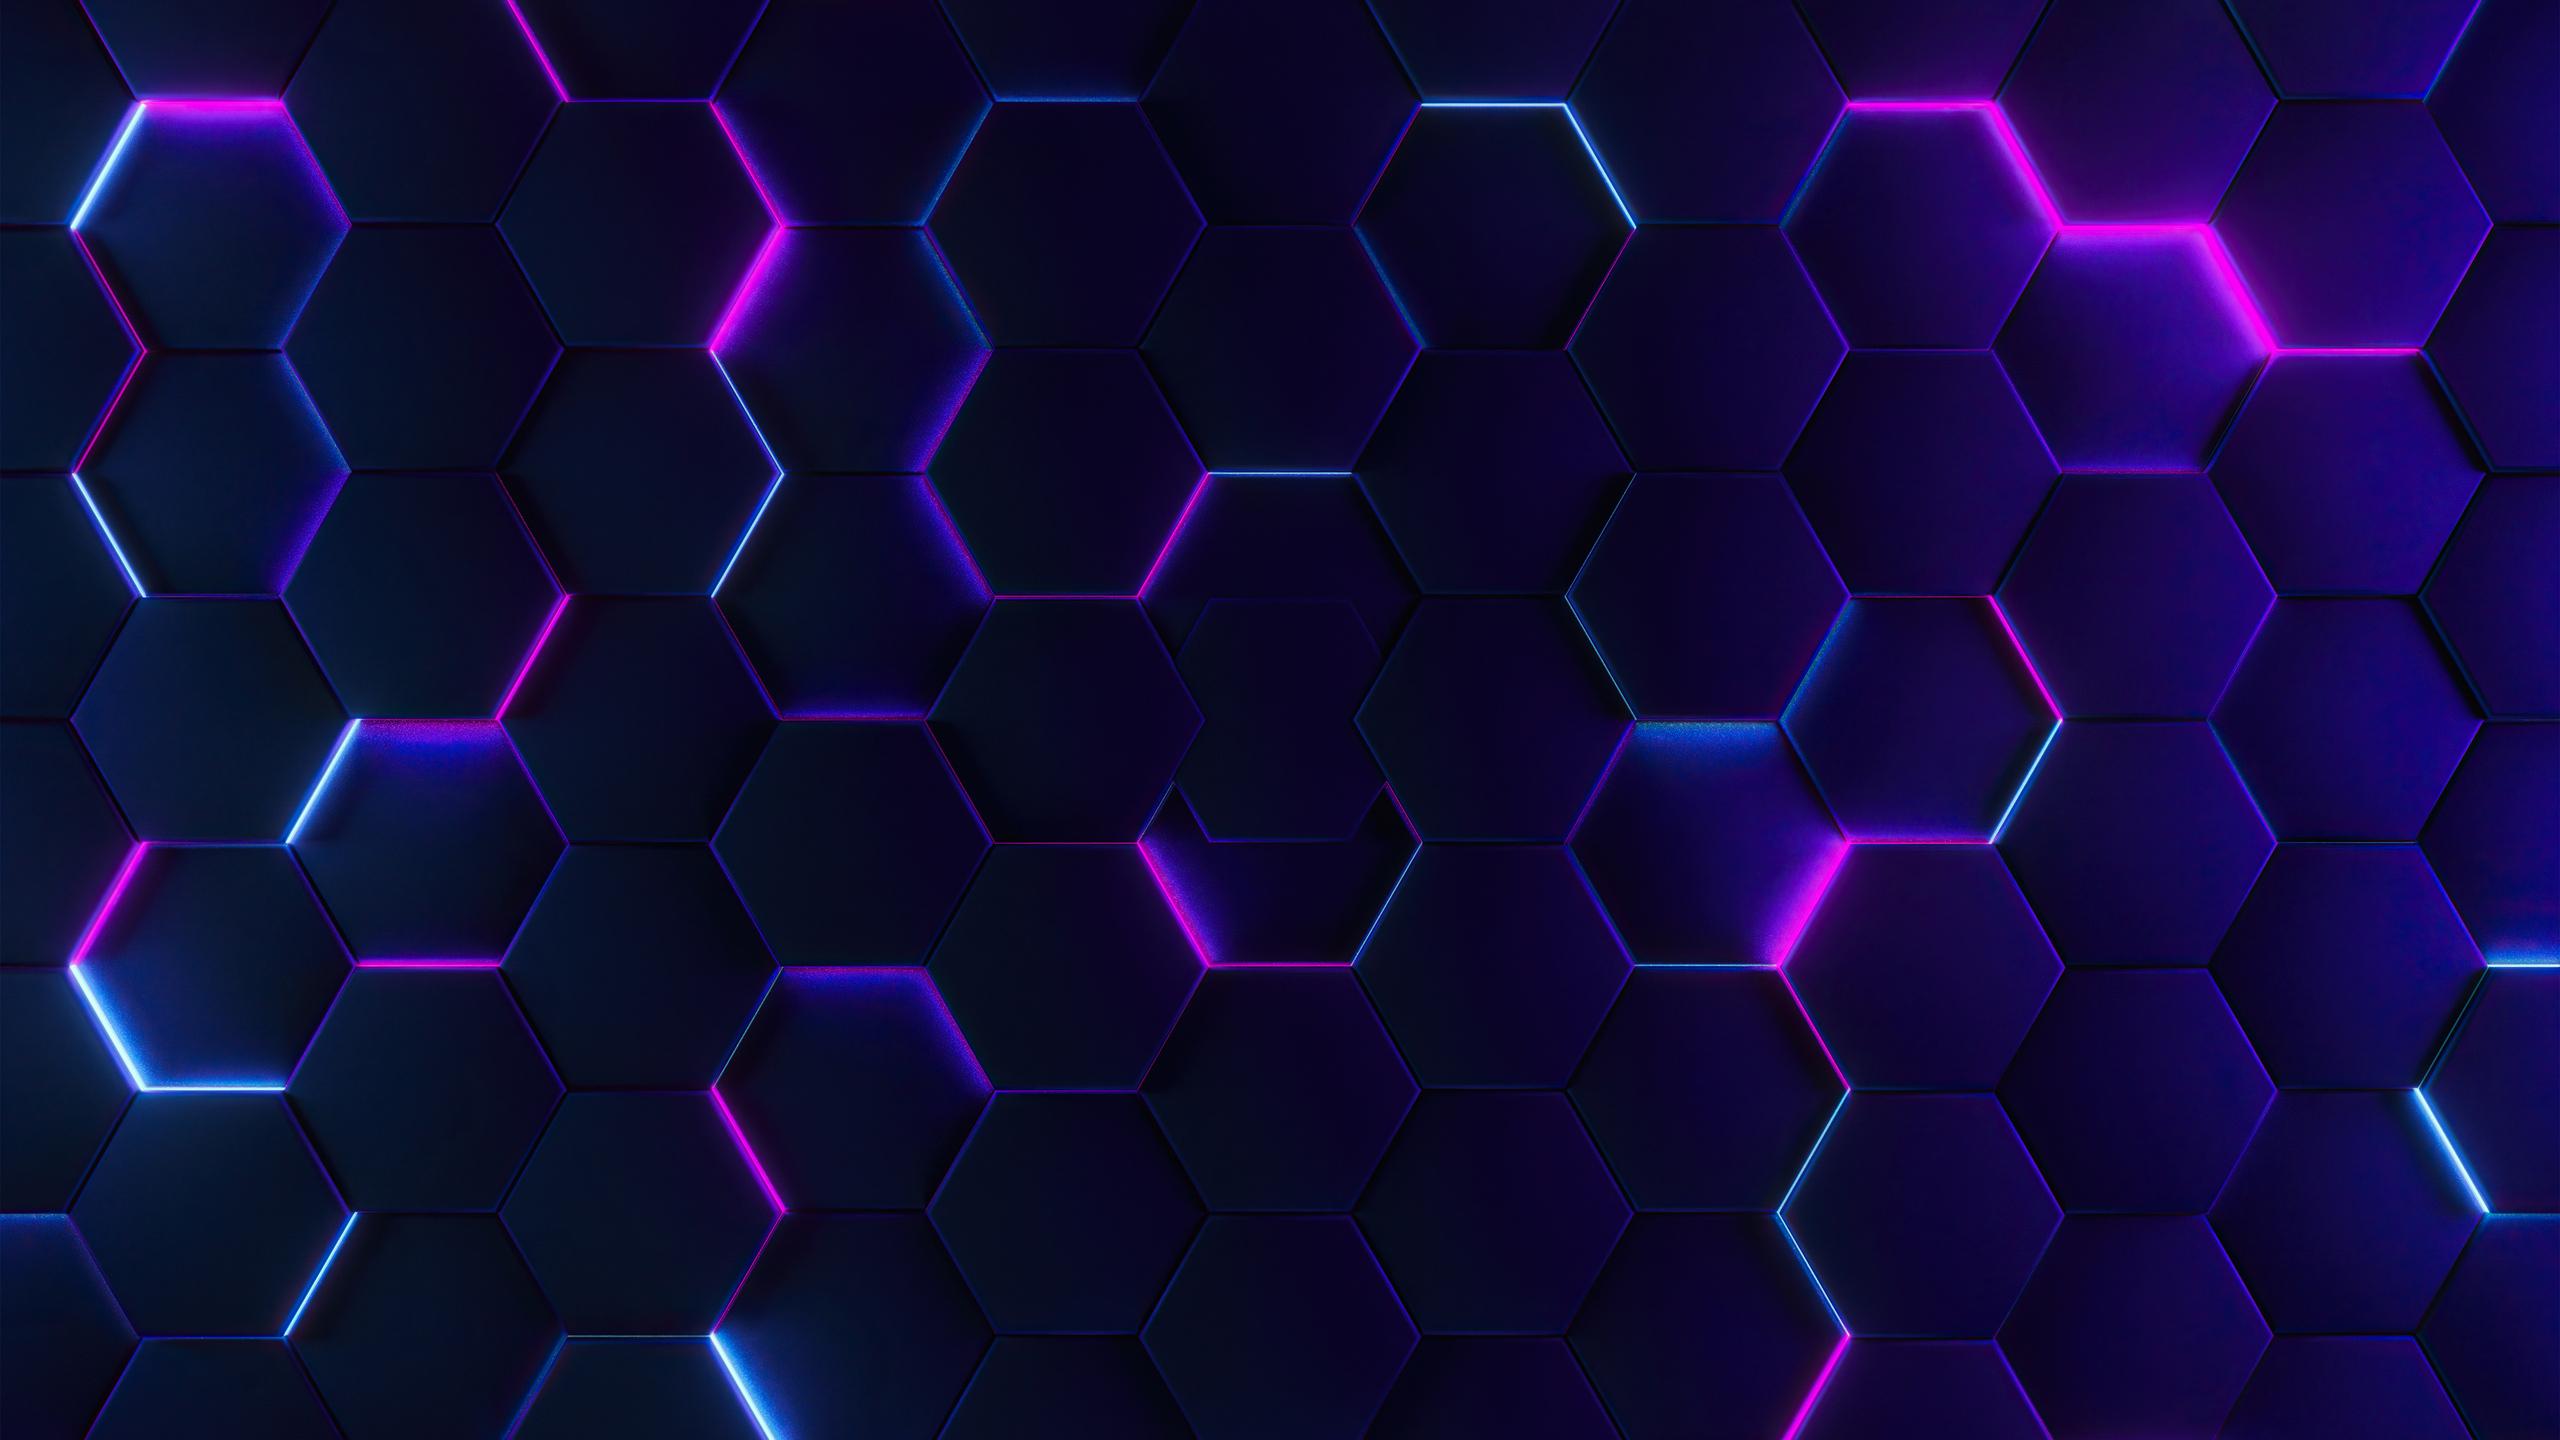 General 2560x1440 abstract hexagon glowing digital art texture CGI purple